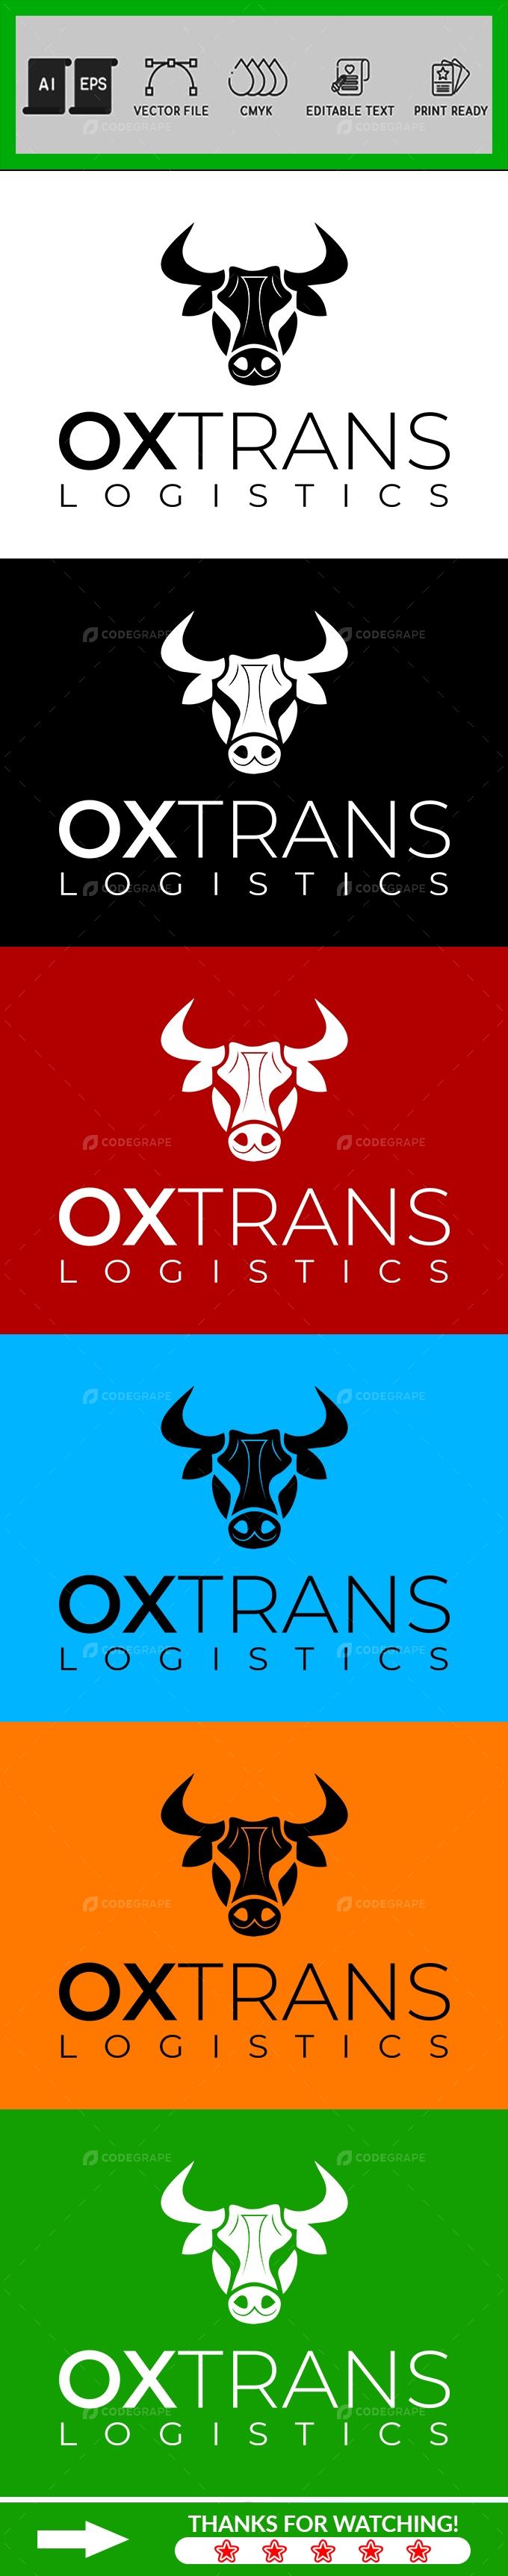 OX Logo Design Template